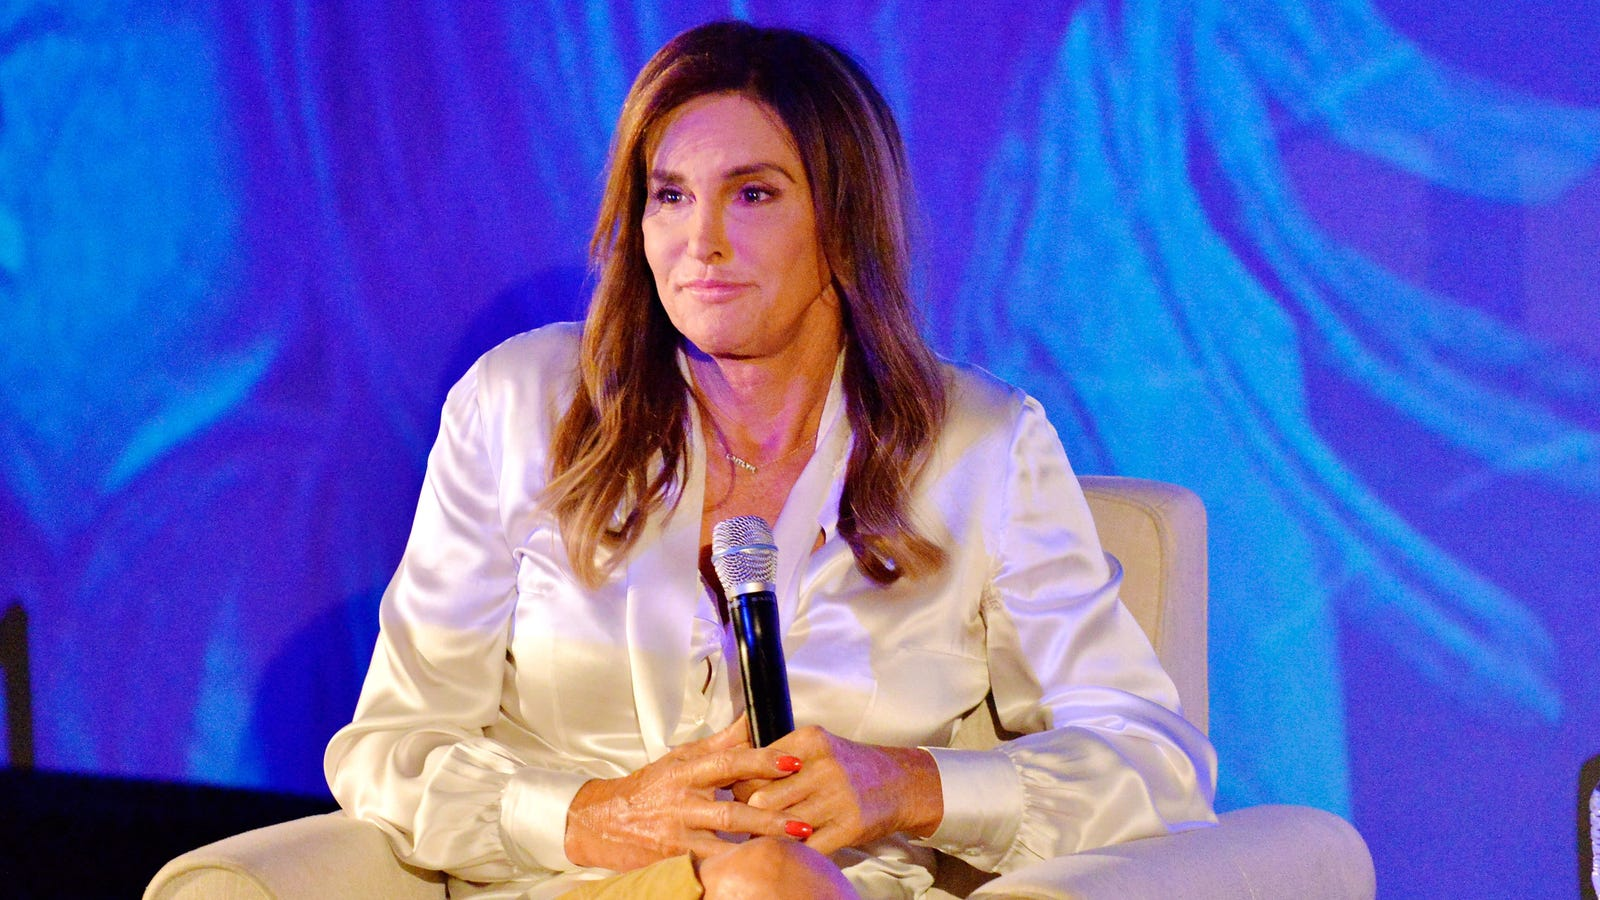 tfy0nctukj8gmkluhepz - Caitlyn Jenner Says Trump Set Back the Transgender Community 20 Years